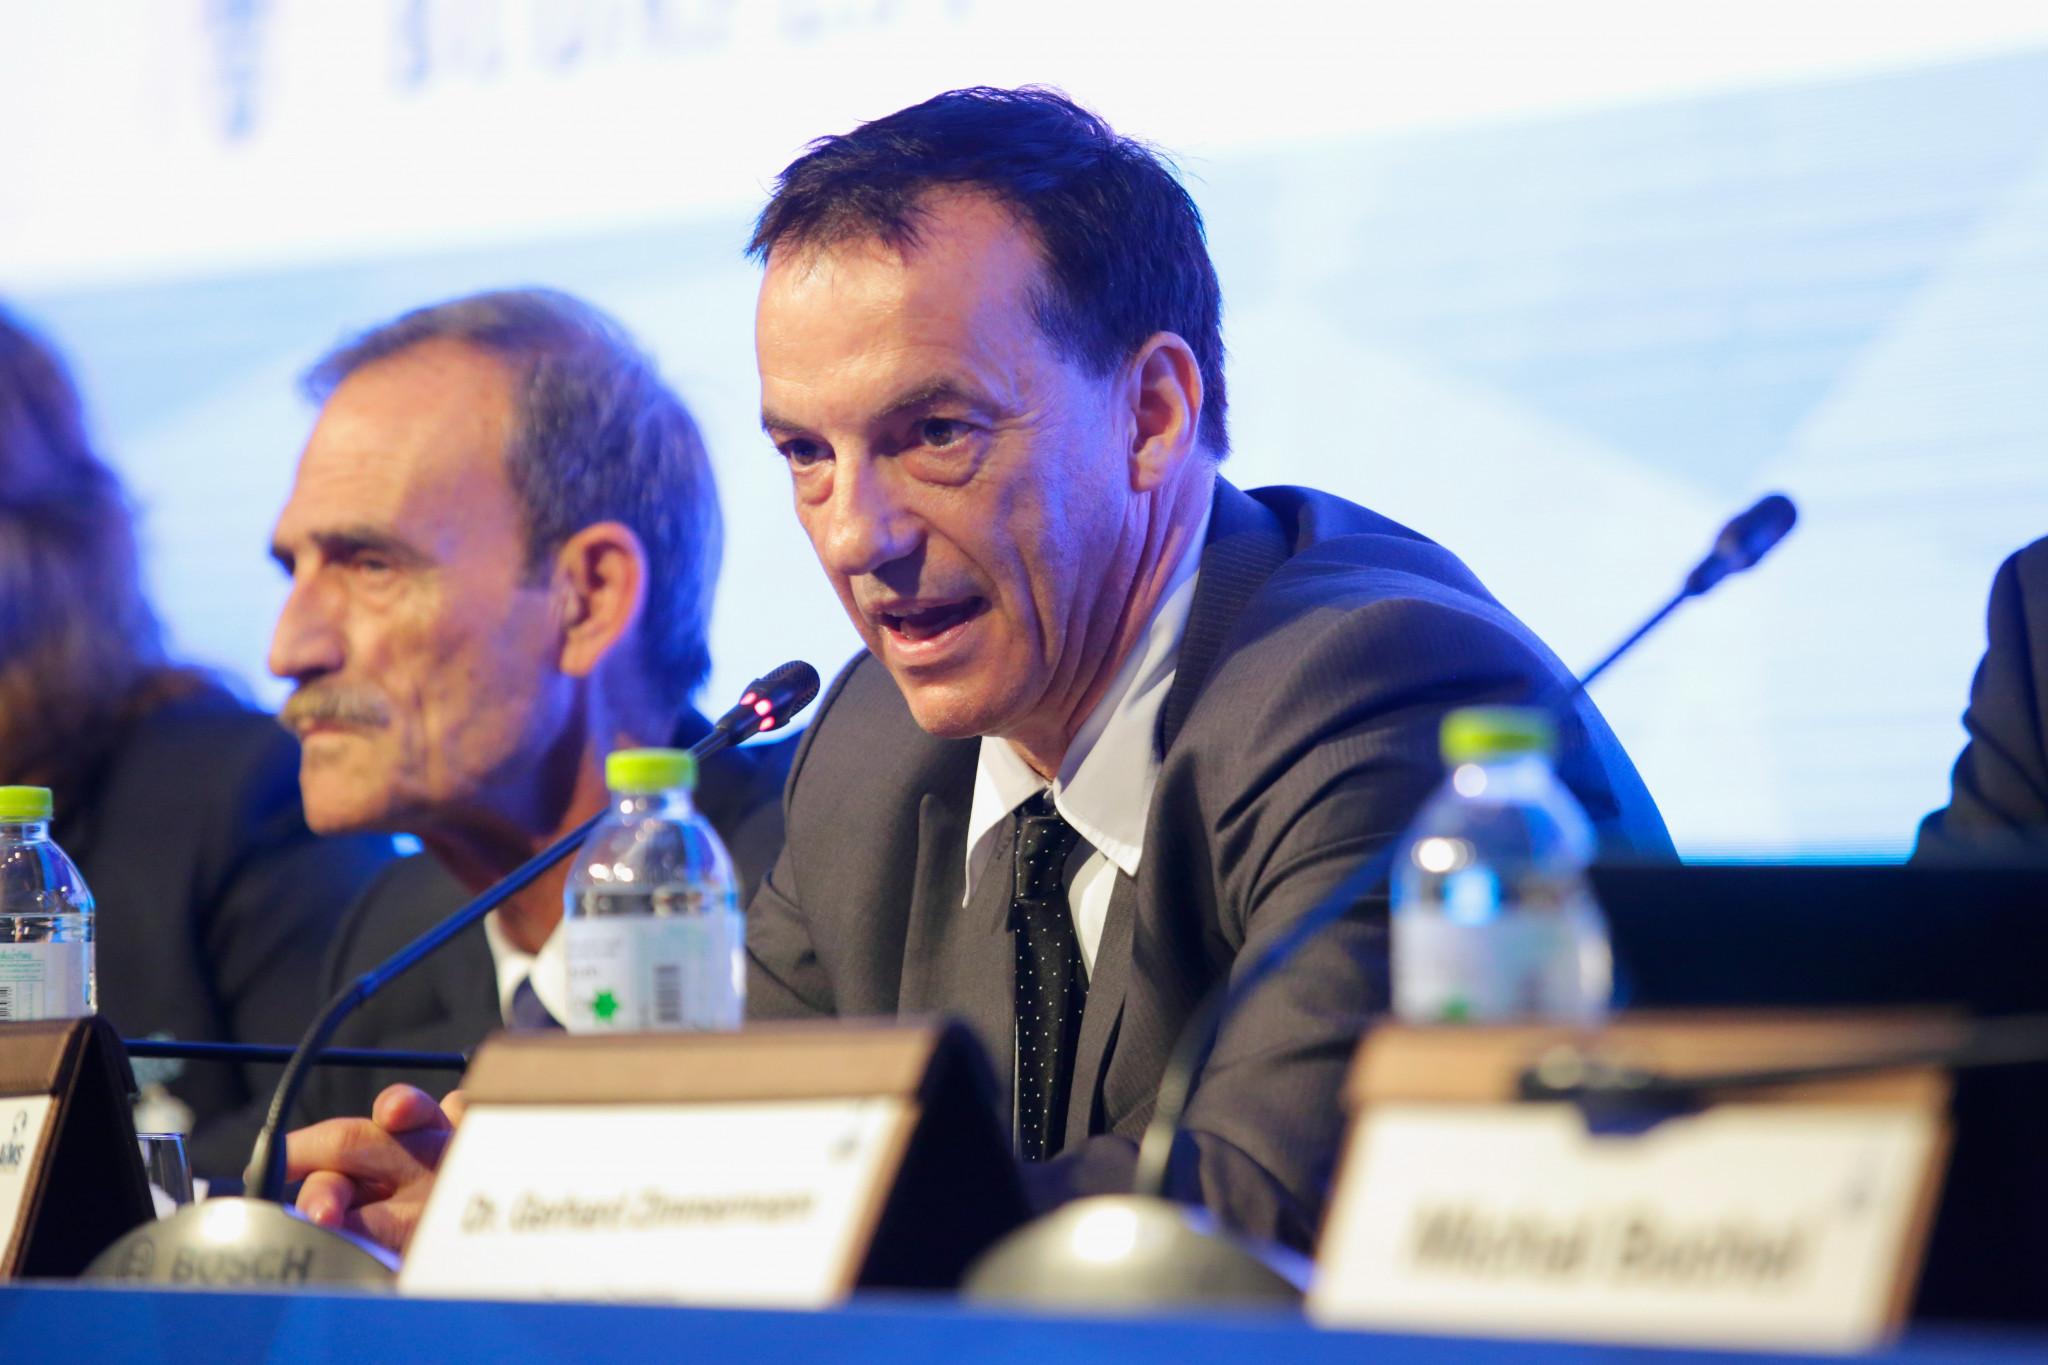 AIMS President Fox praises progress of teqball